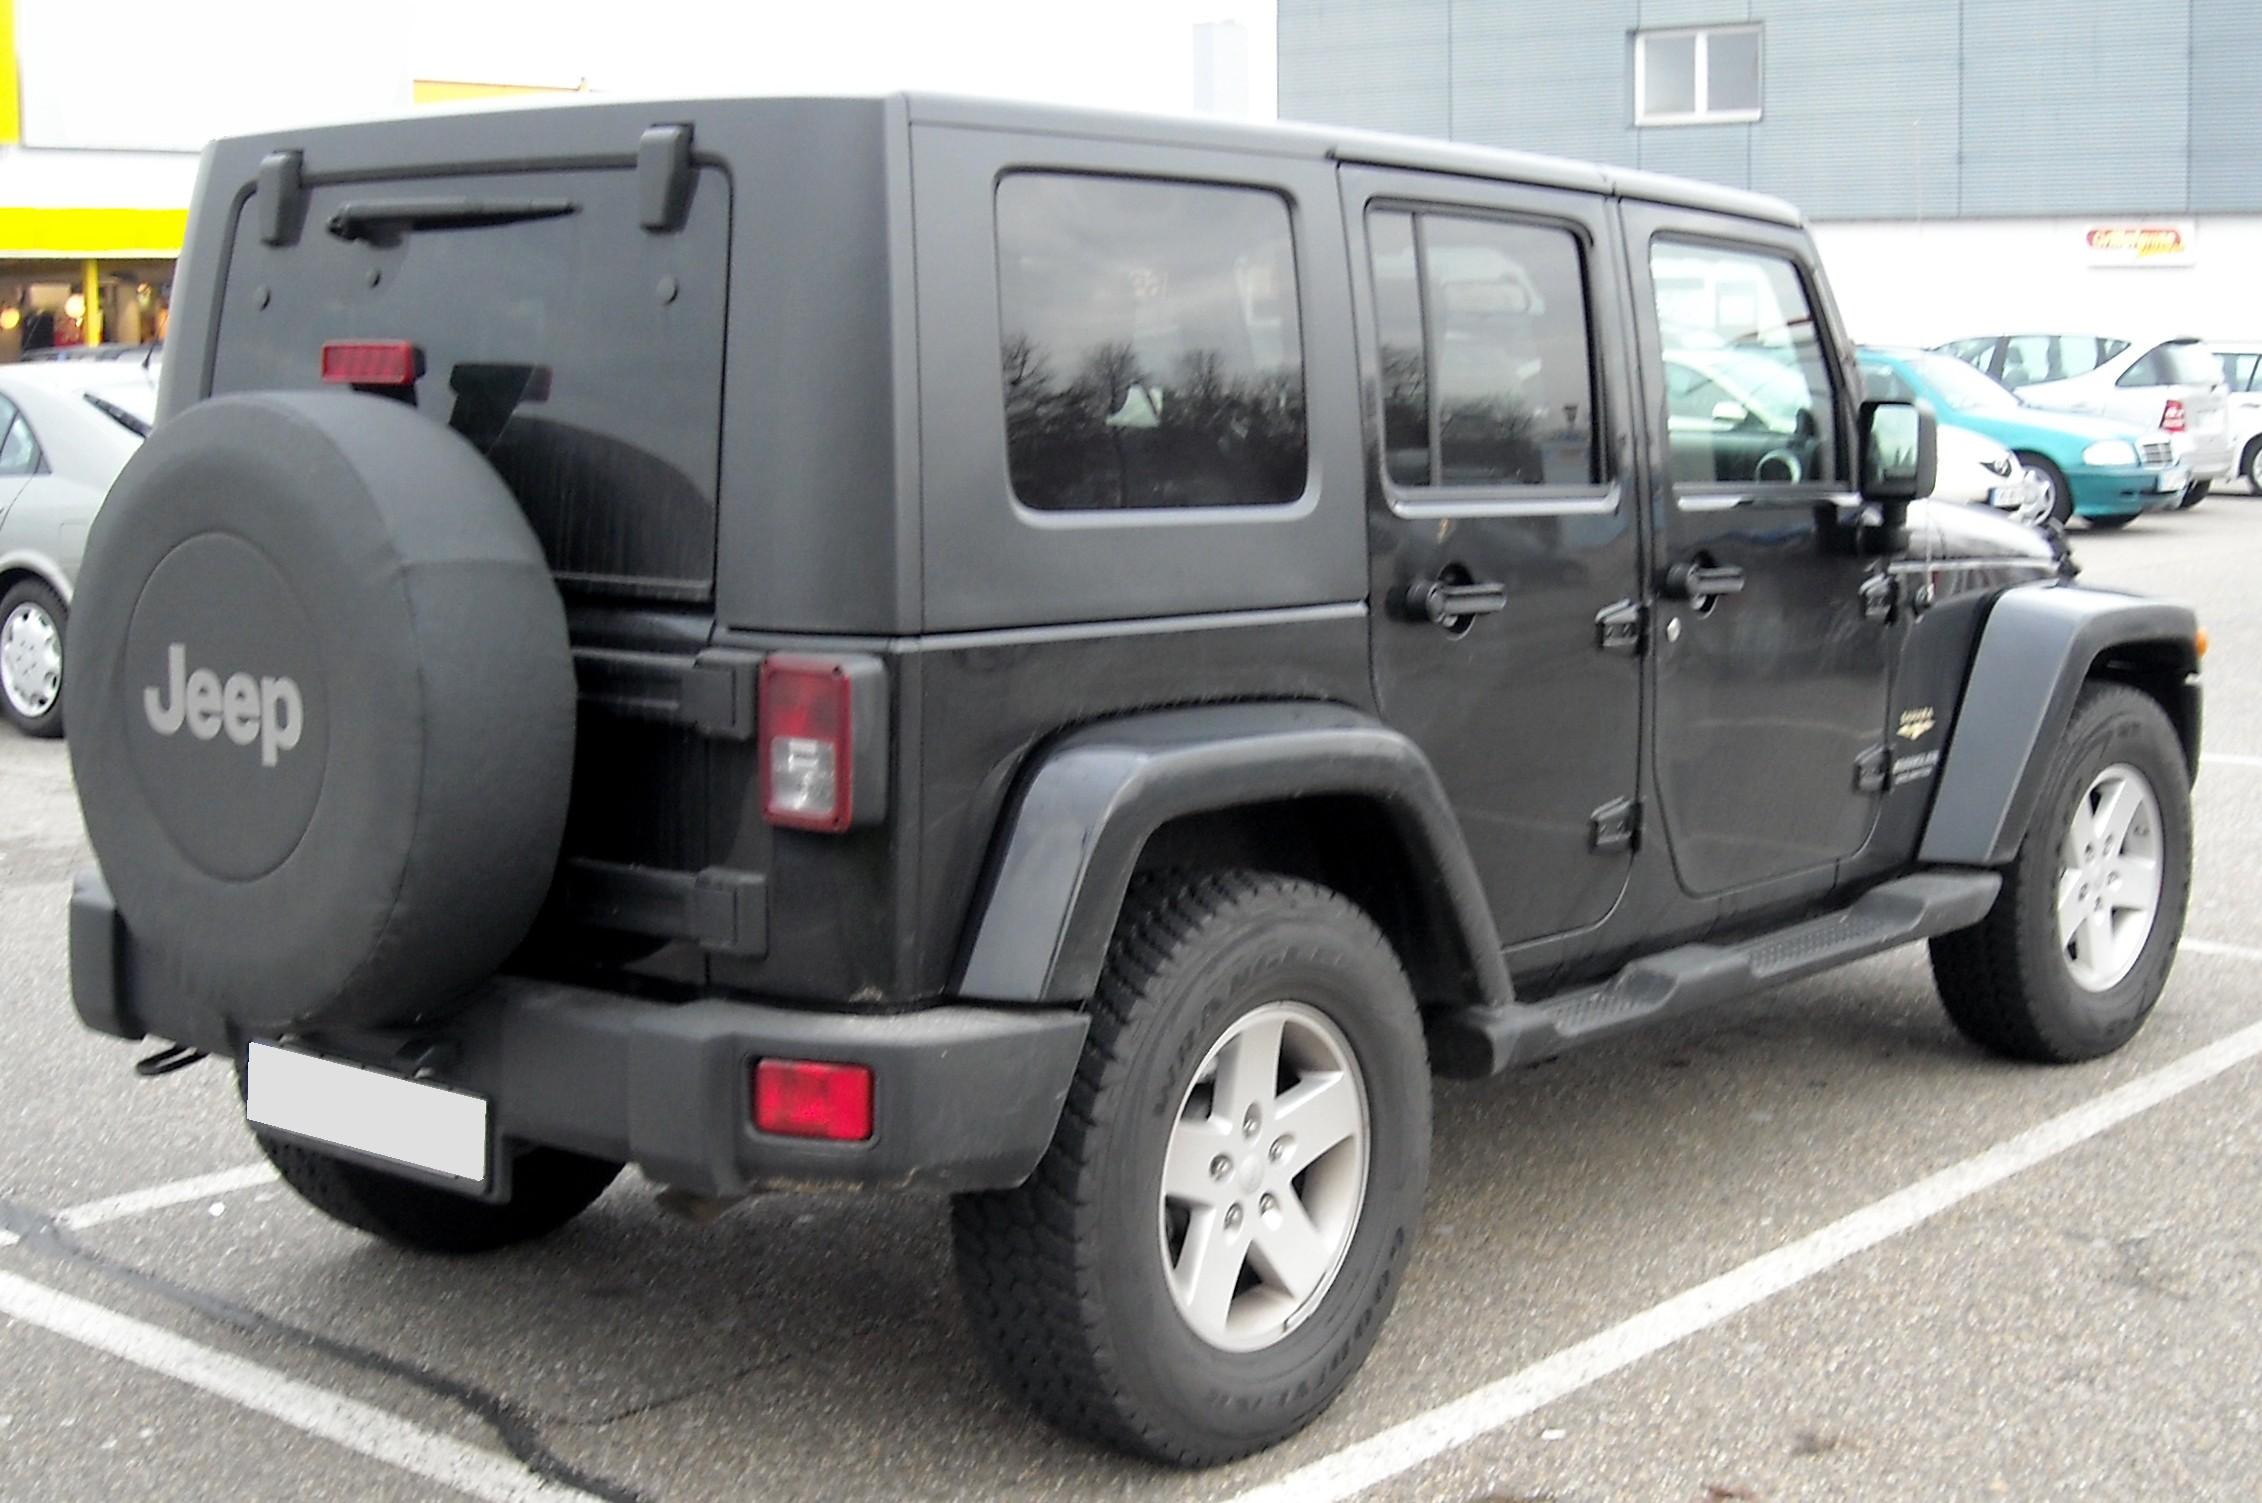 Wrangler Jl Sport >> File:Jeep Wrangler Unlimited rear 20081213.jpg - Wikimedia Commons